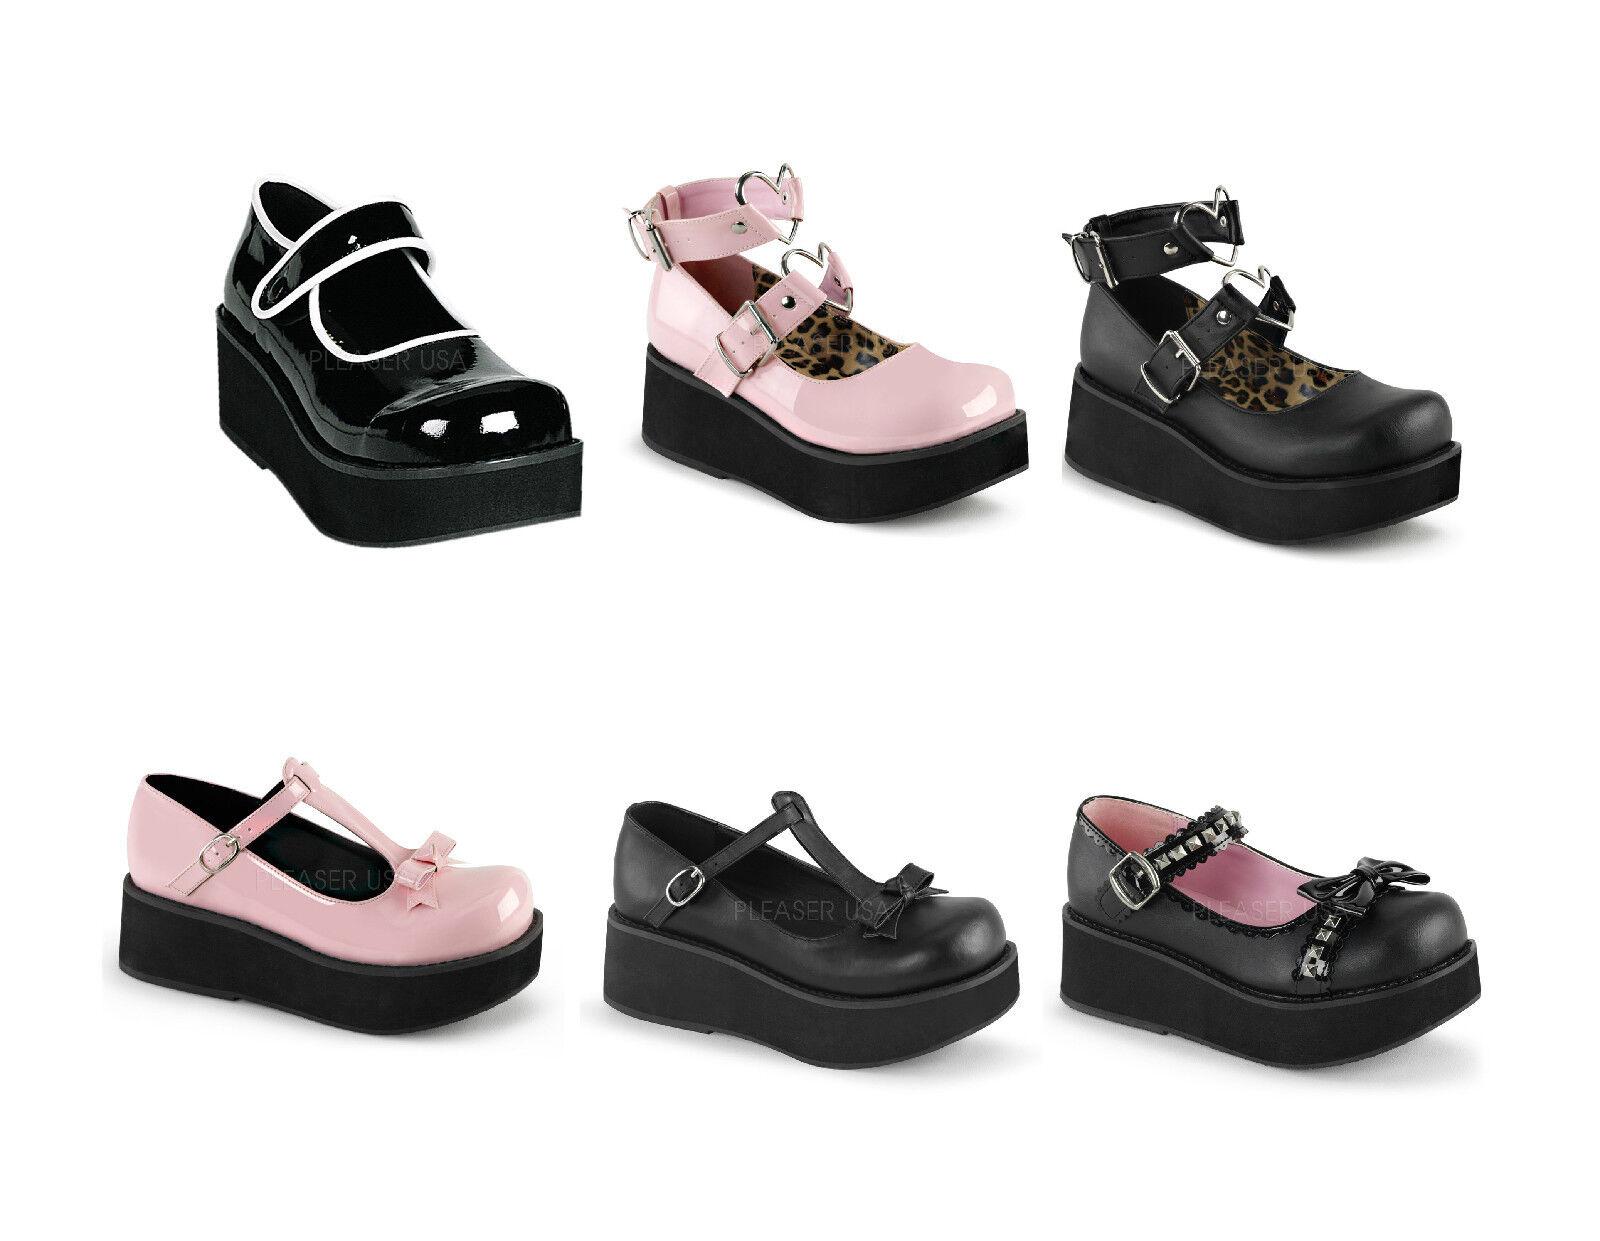 Demonia SPRITE-01 SPRITE-01 SPRITE-01 02 03 04 Women's Platform shoes 801098